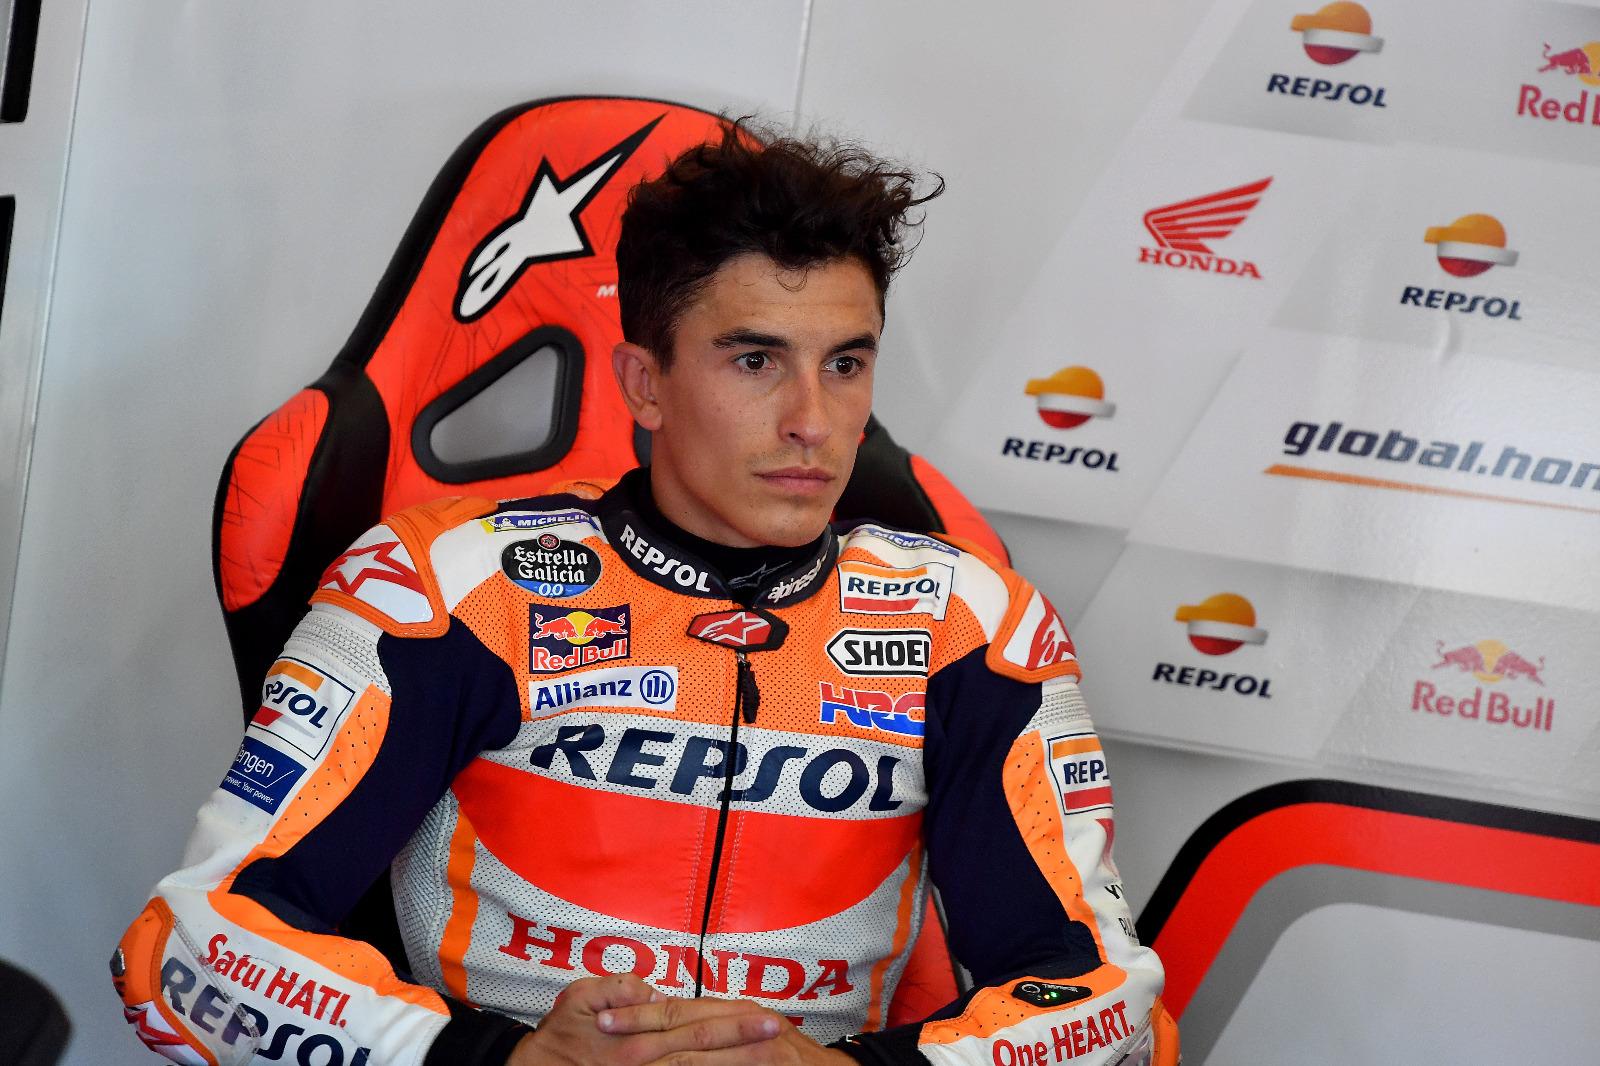 Successful surgery for Marc Marquez, Alex Marquez prepares for second run in Jerez